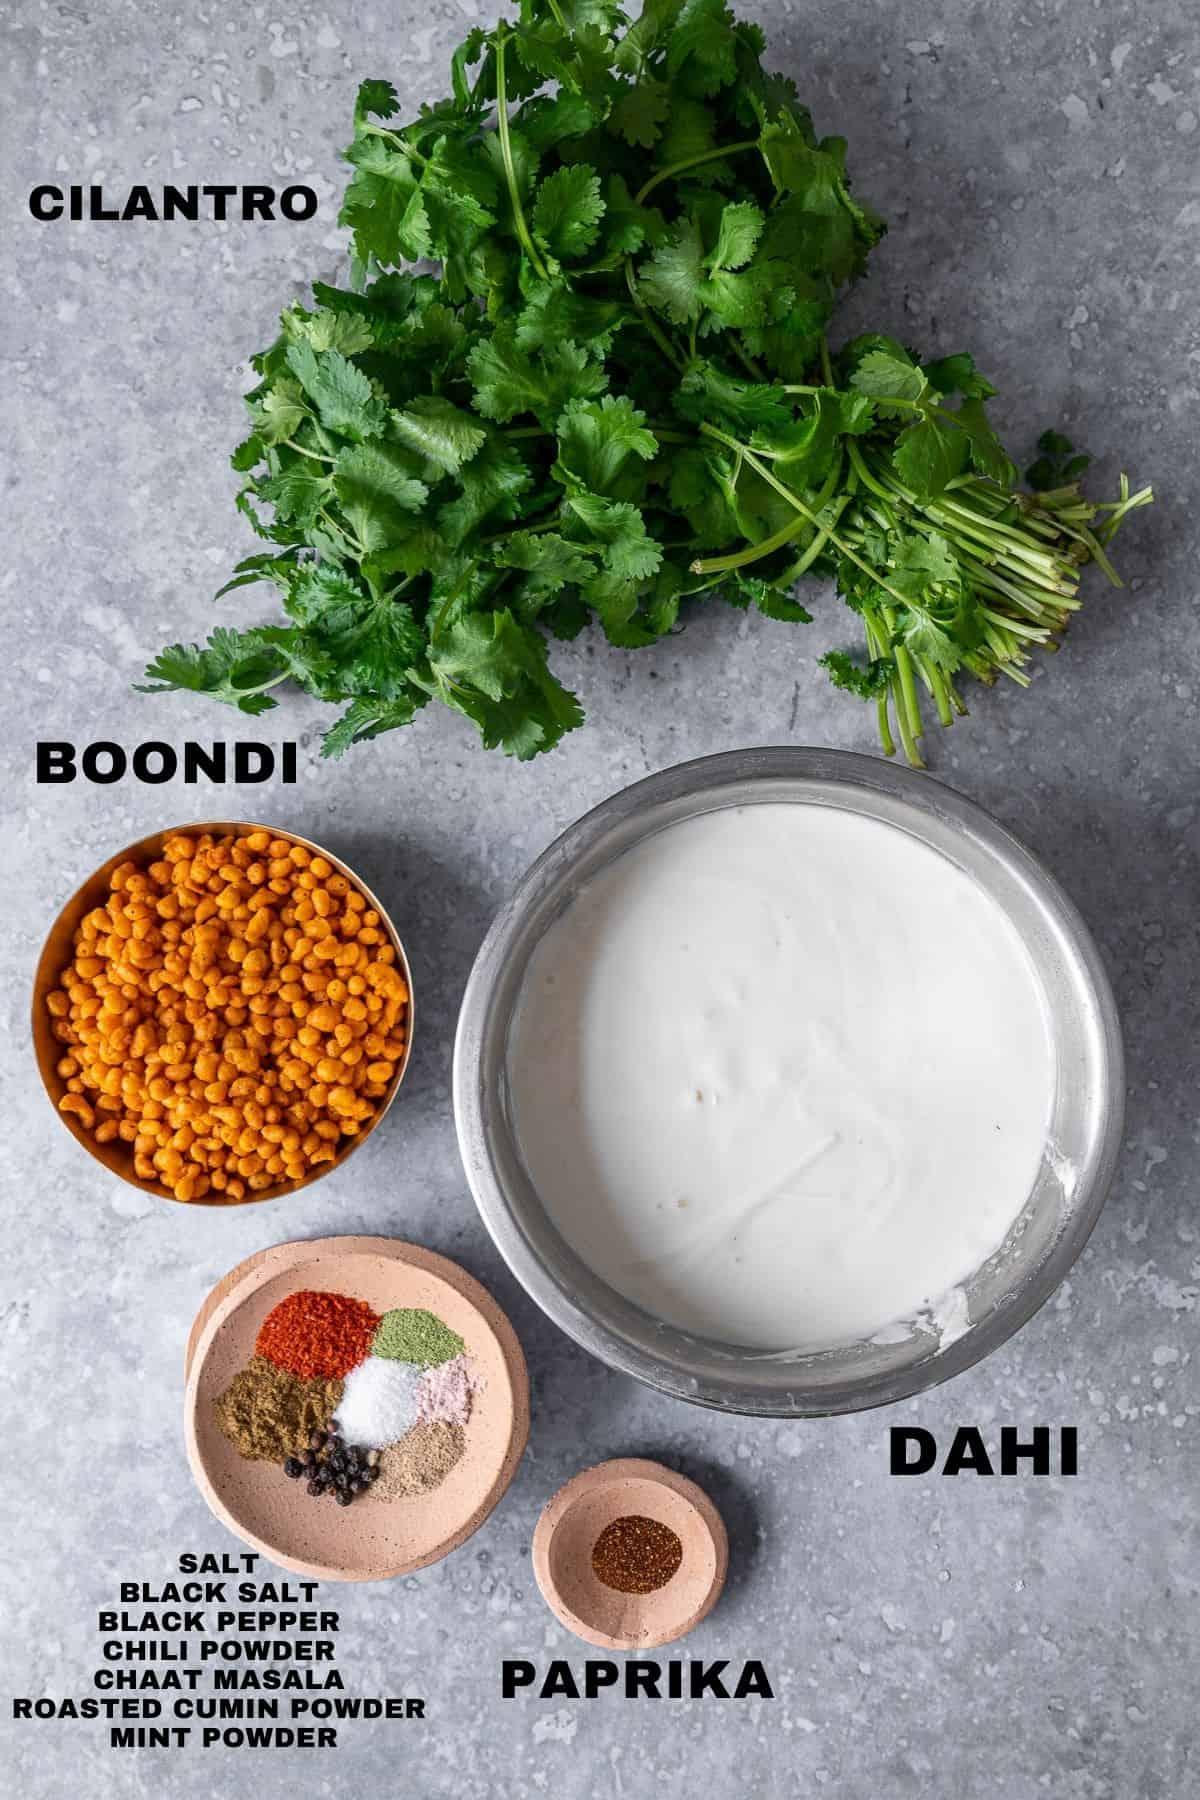 flatlay of boondi raita ingredients with labels